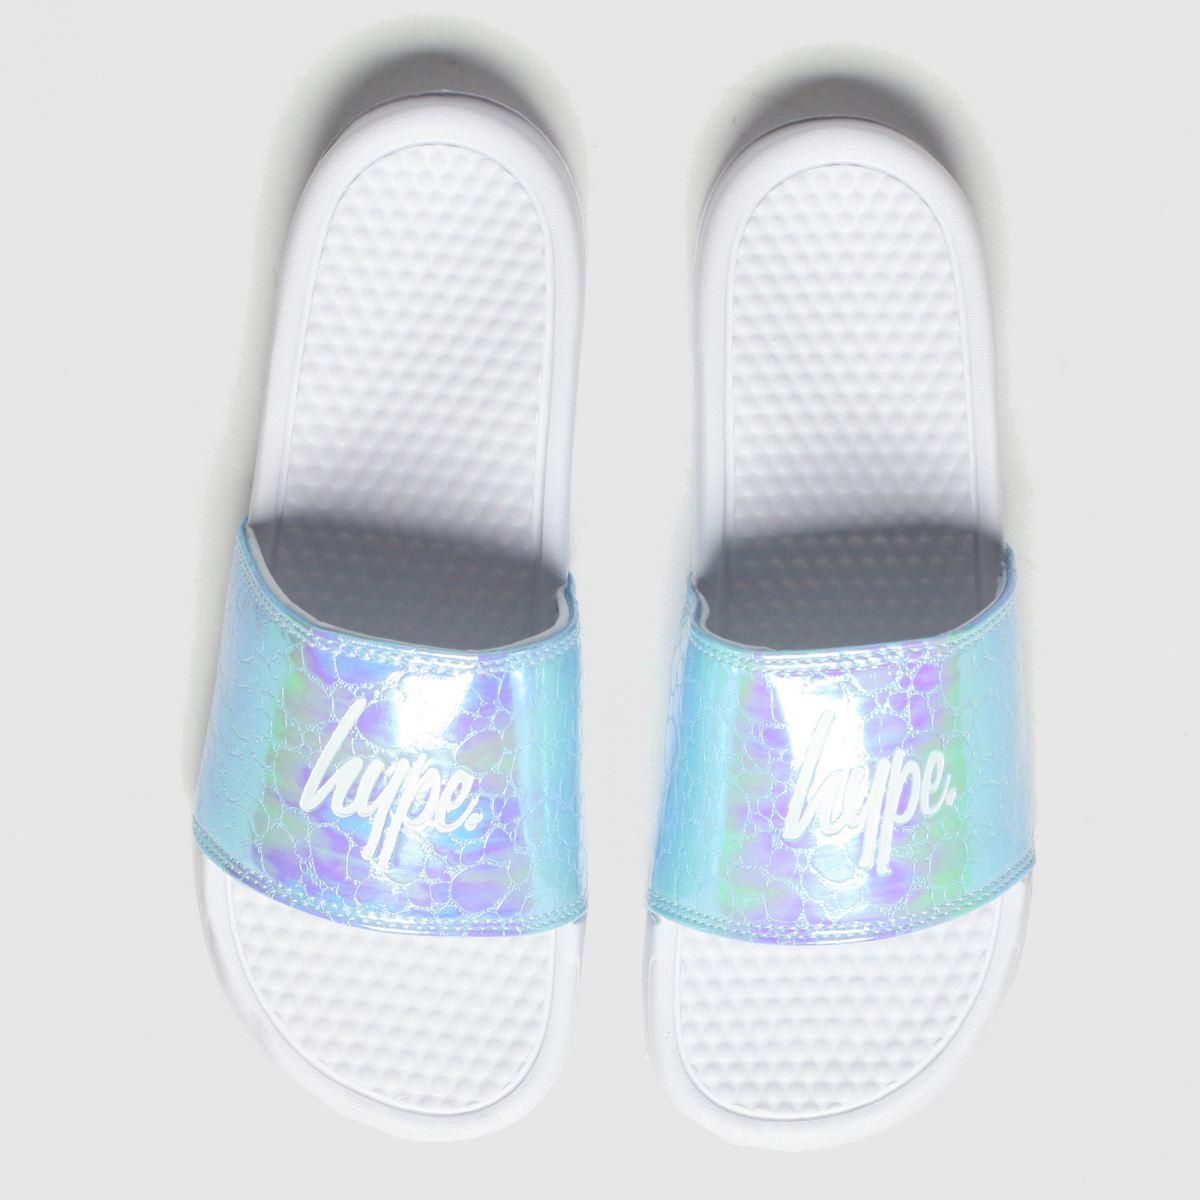 Hype Pale Blue Iridescent Sliders Sandals